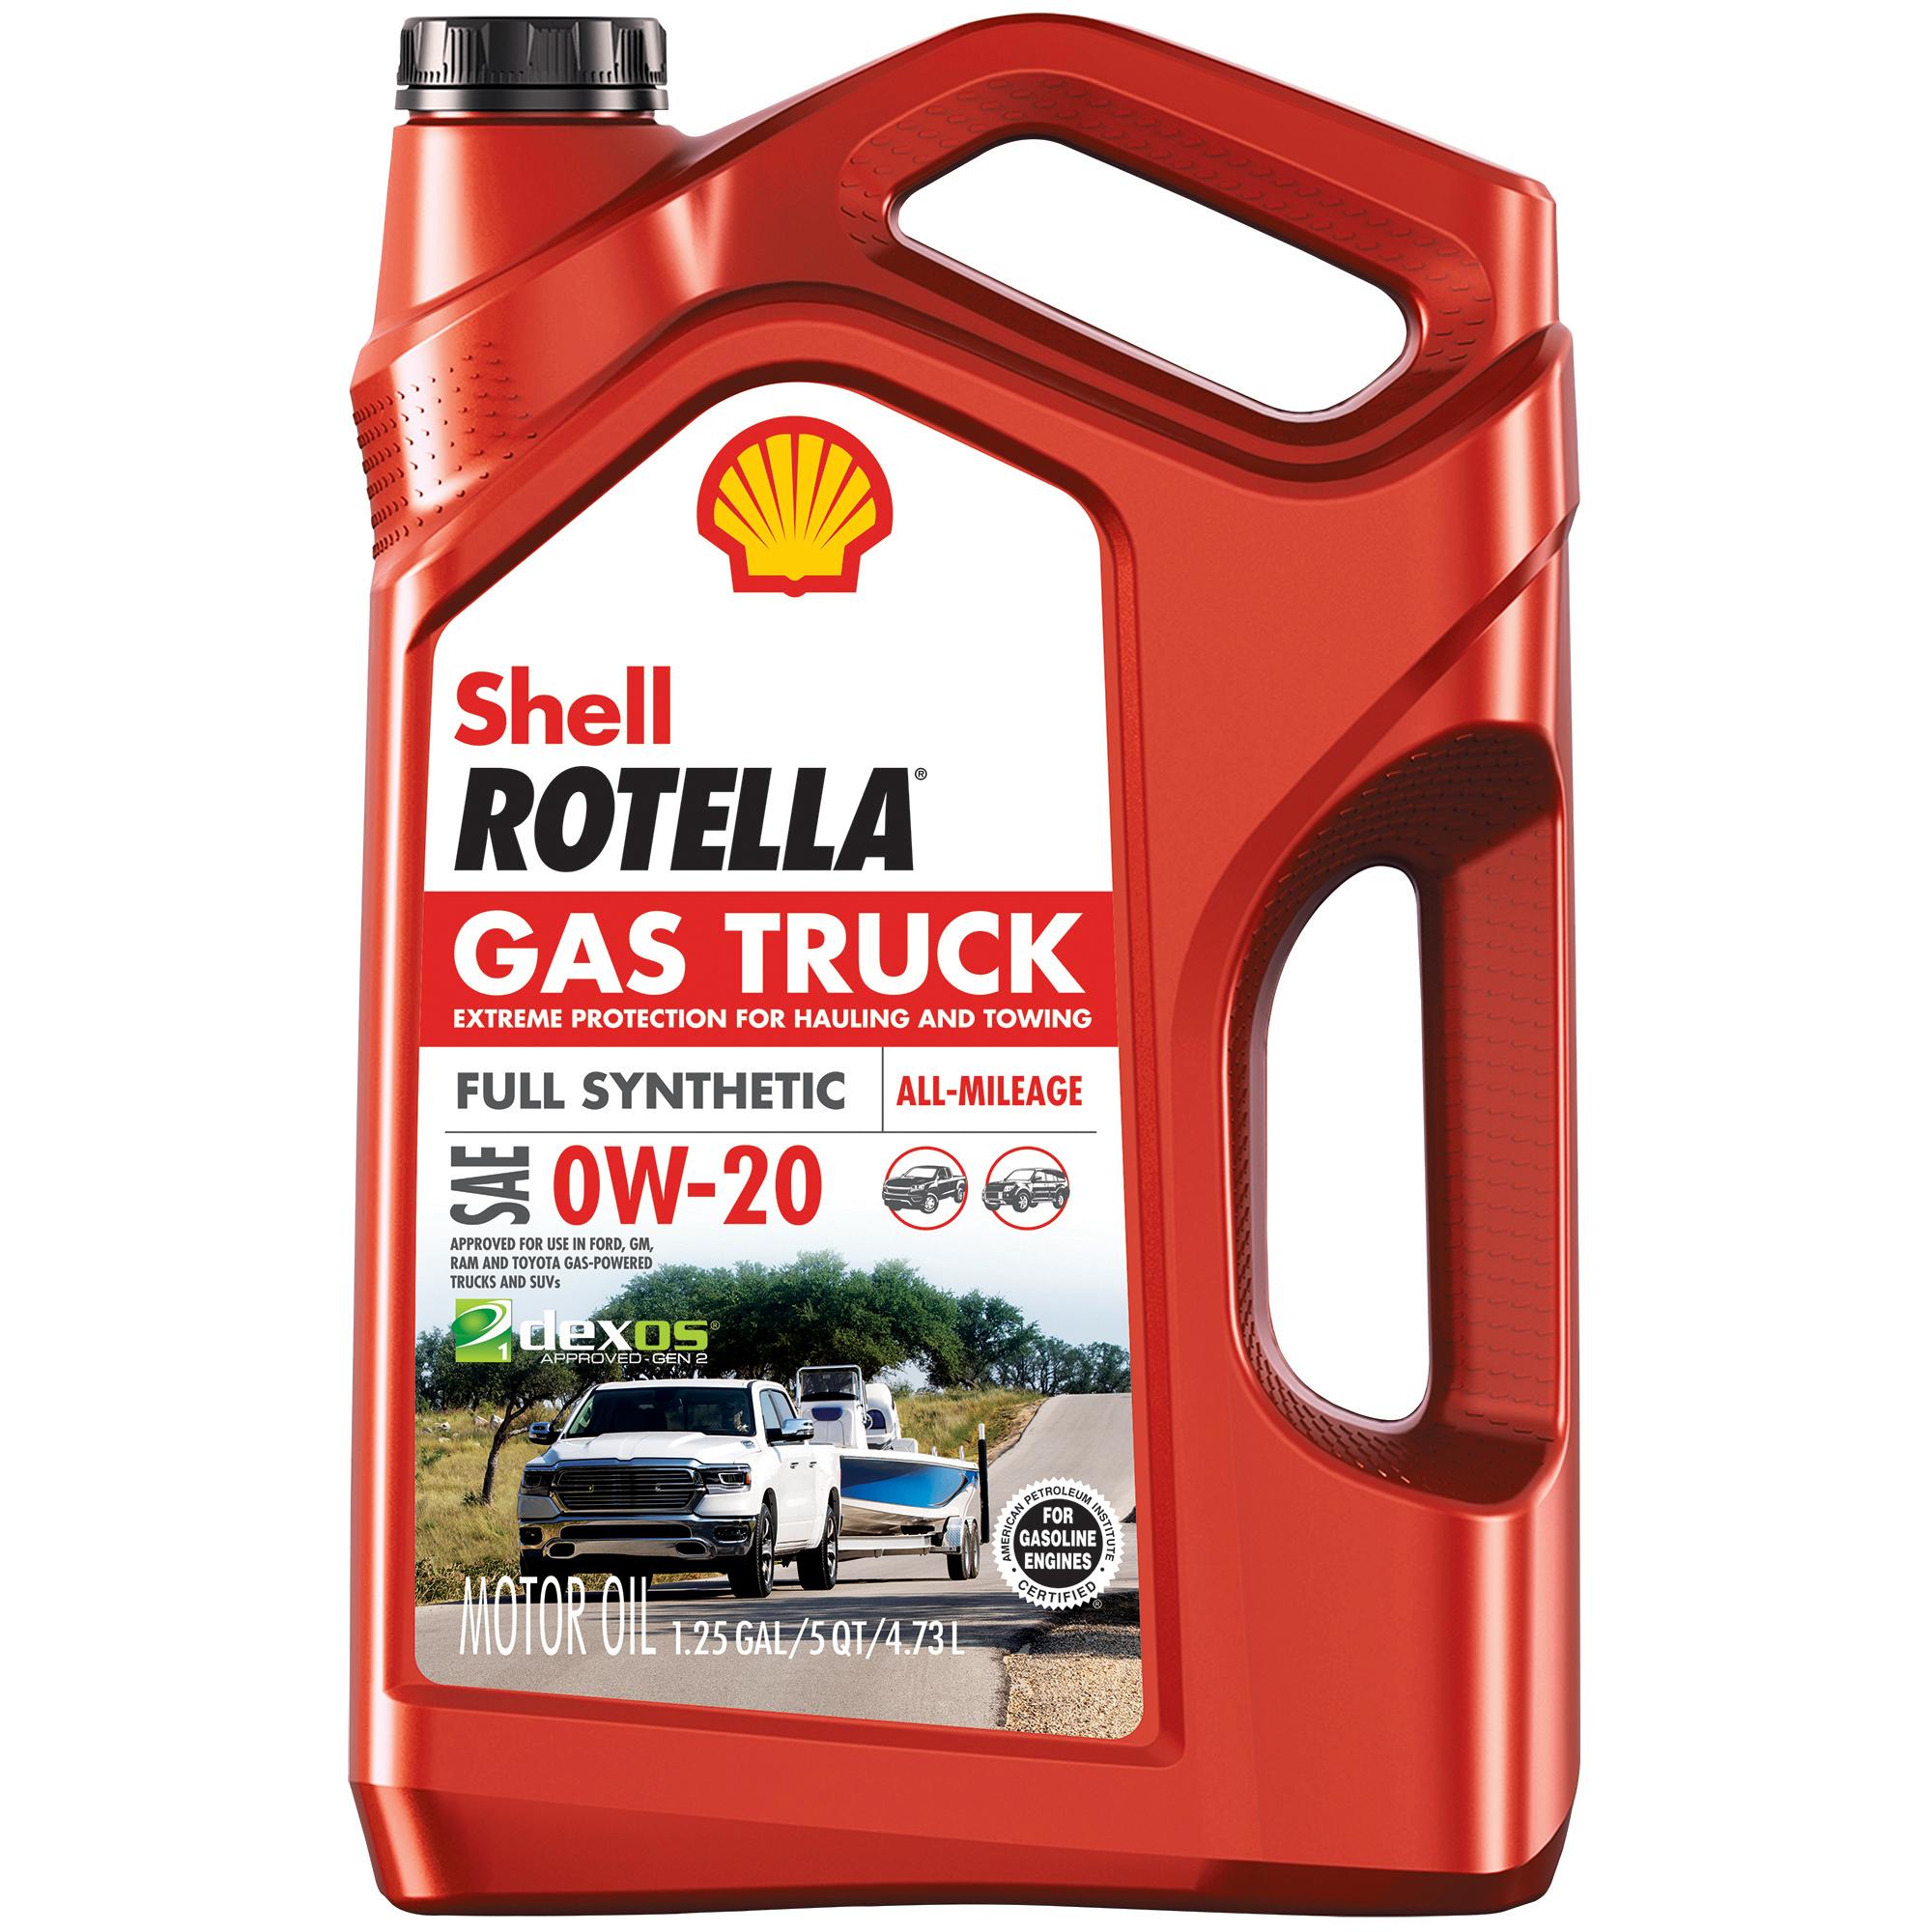 Walmart clearance $11  Shell Rotella full synthetic 0w-20 oil 5-quart bottle YMMV